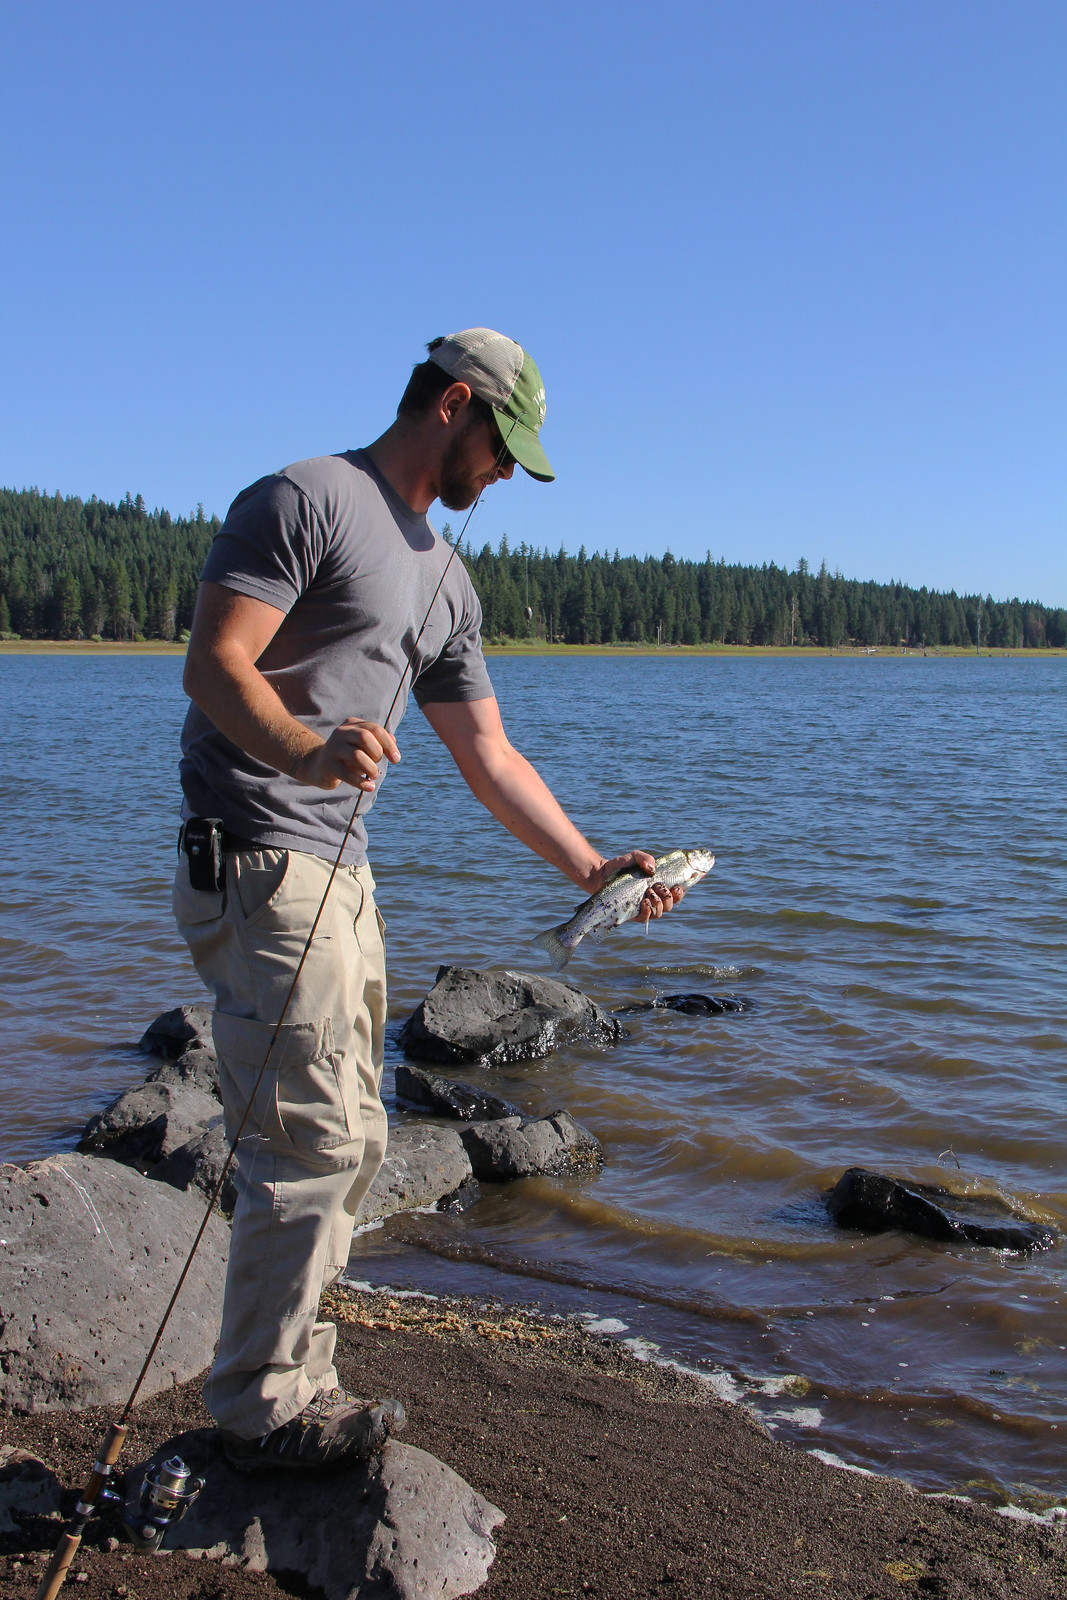 Fishing on Hyatt Lake